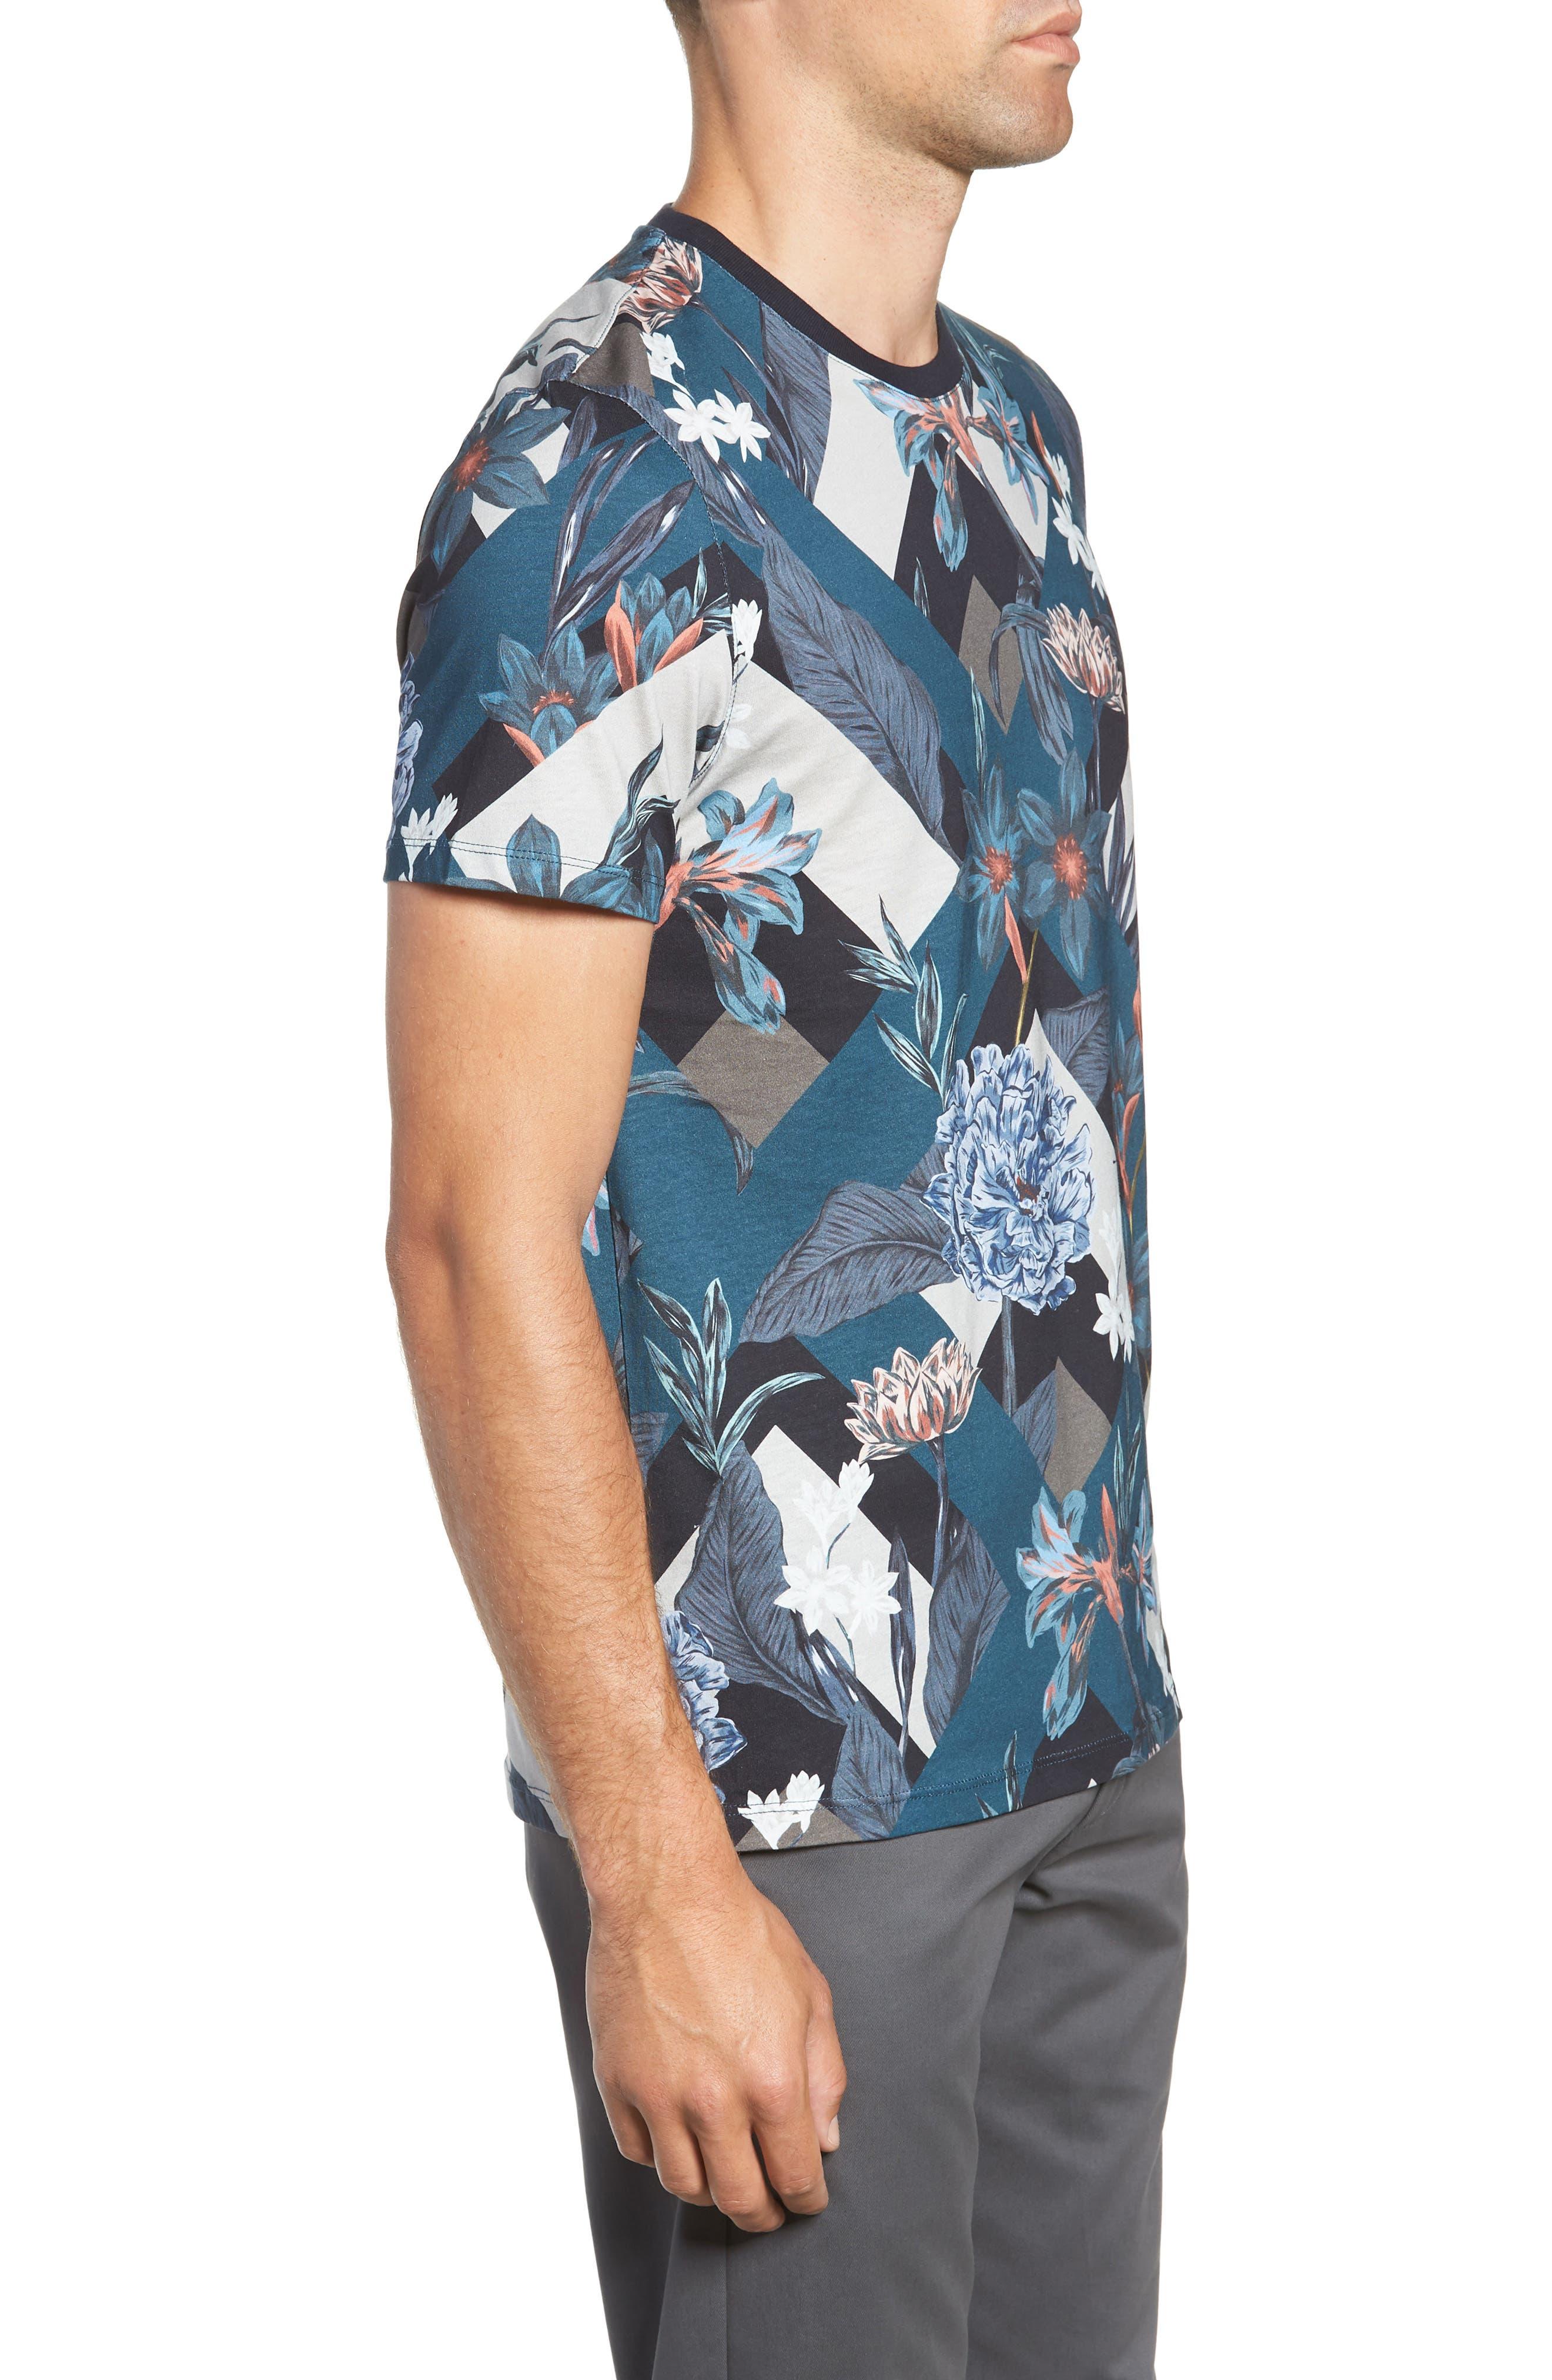 Jolly Slim Fit T-Shirt,                             Alternate thumbnail 3, color,                             410